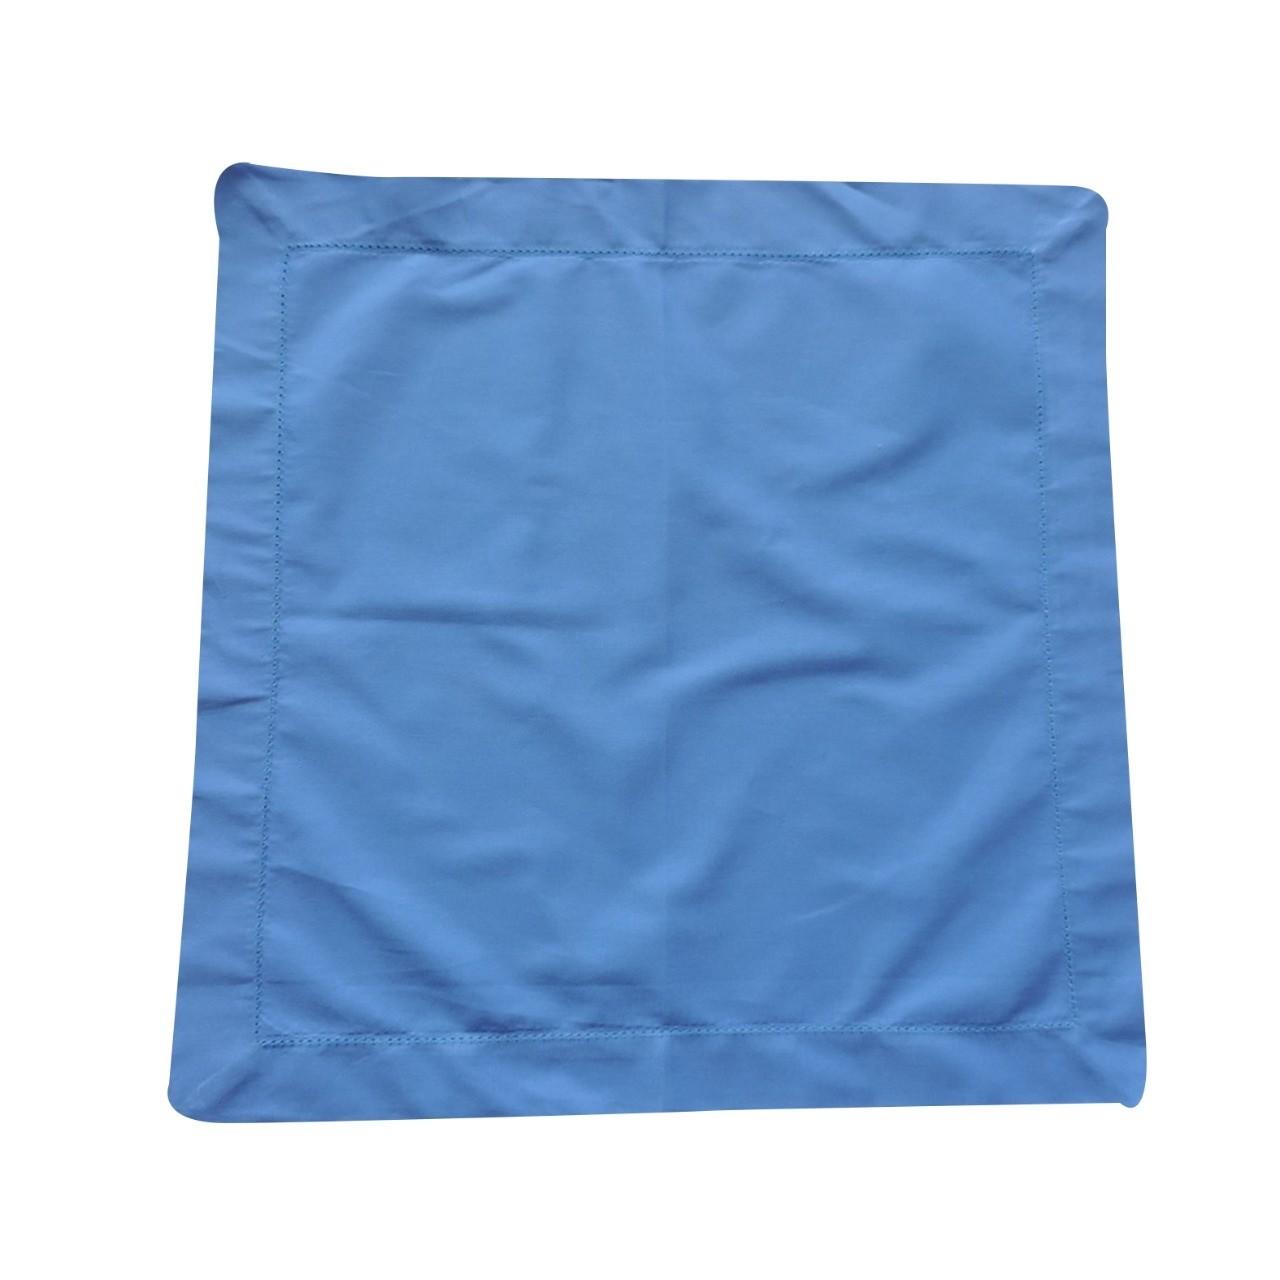 Guardanapo Ponto Aju 40x40cm Tecido Azul - Noemy Artesan